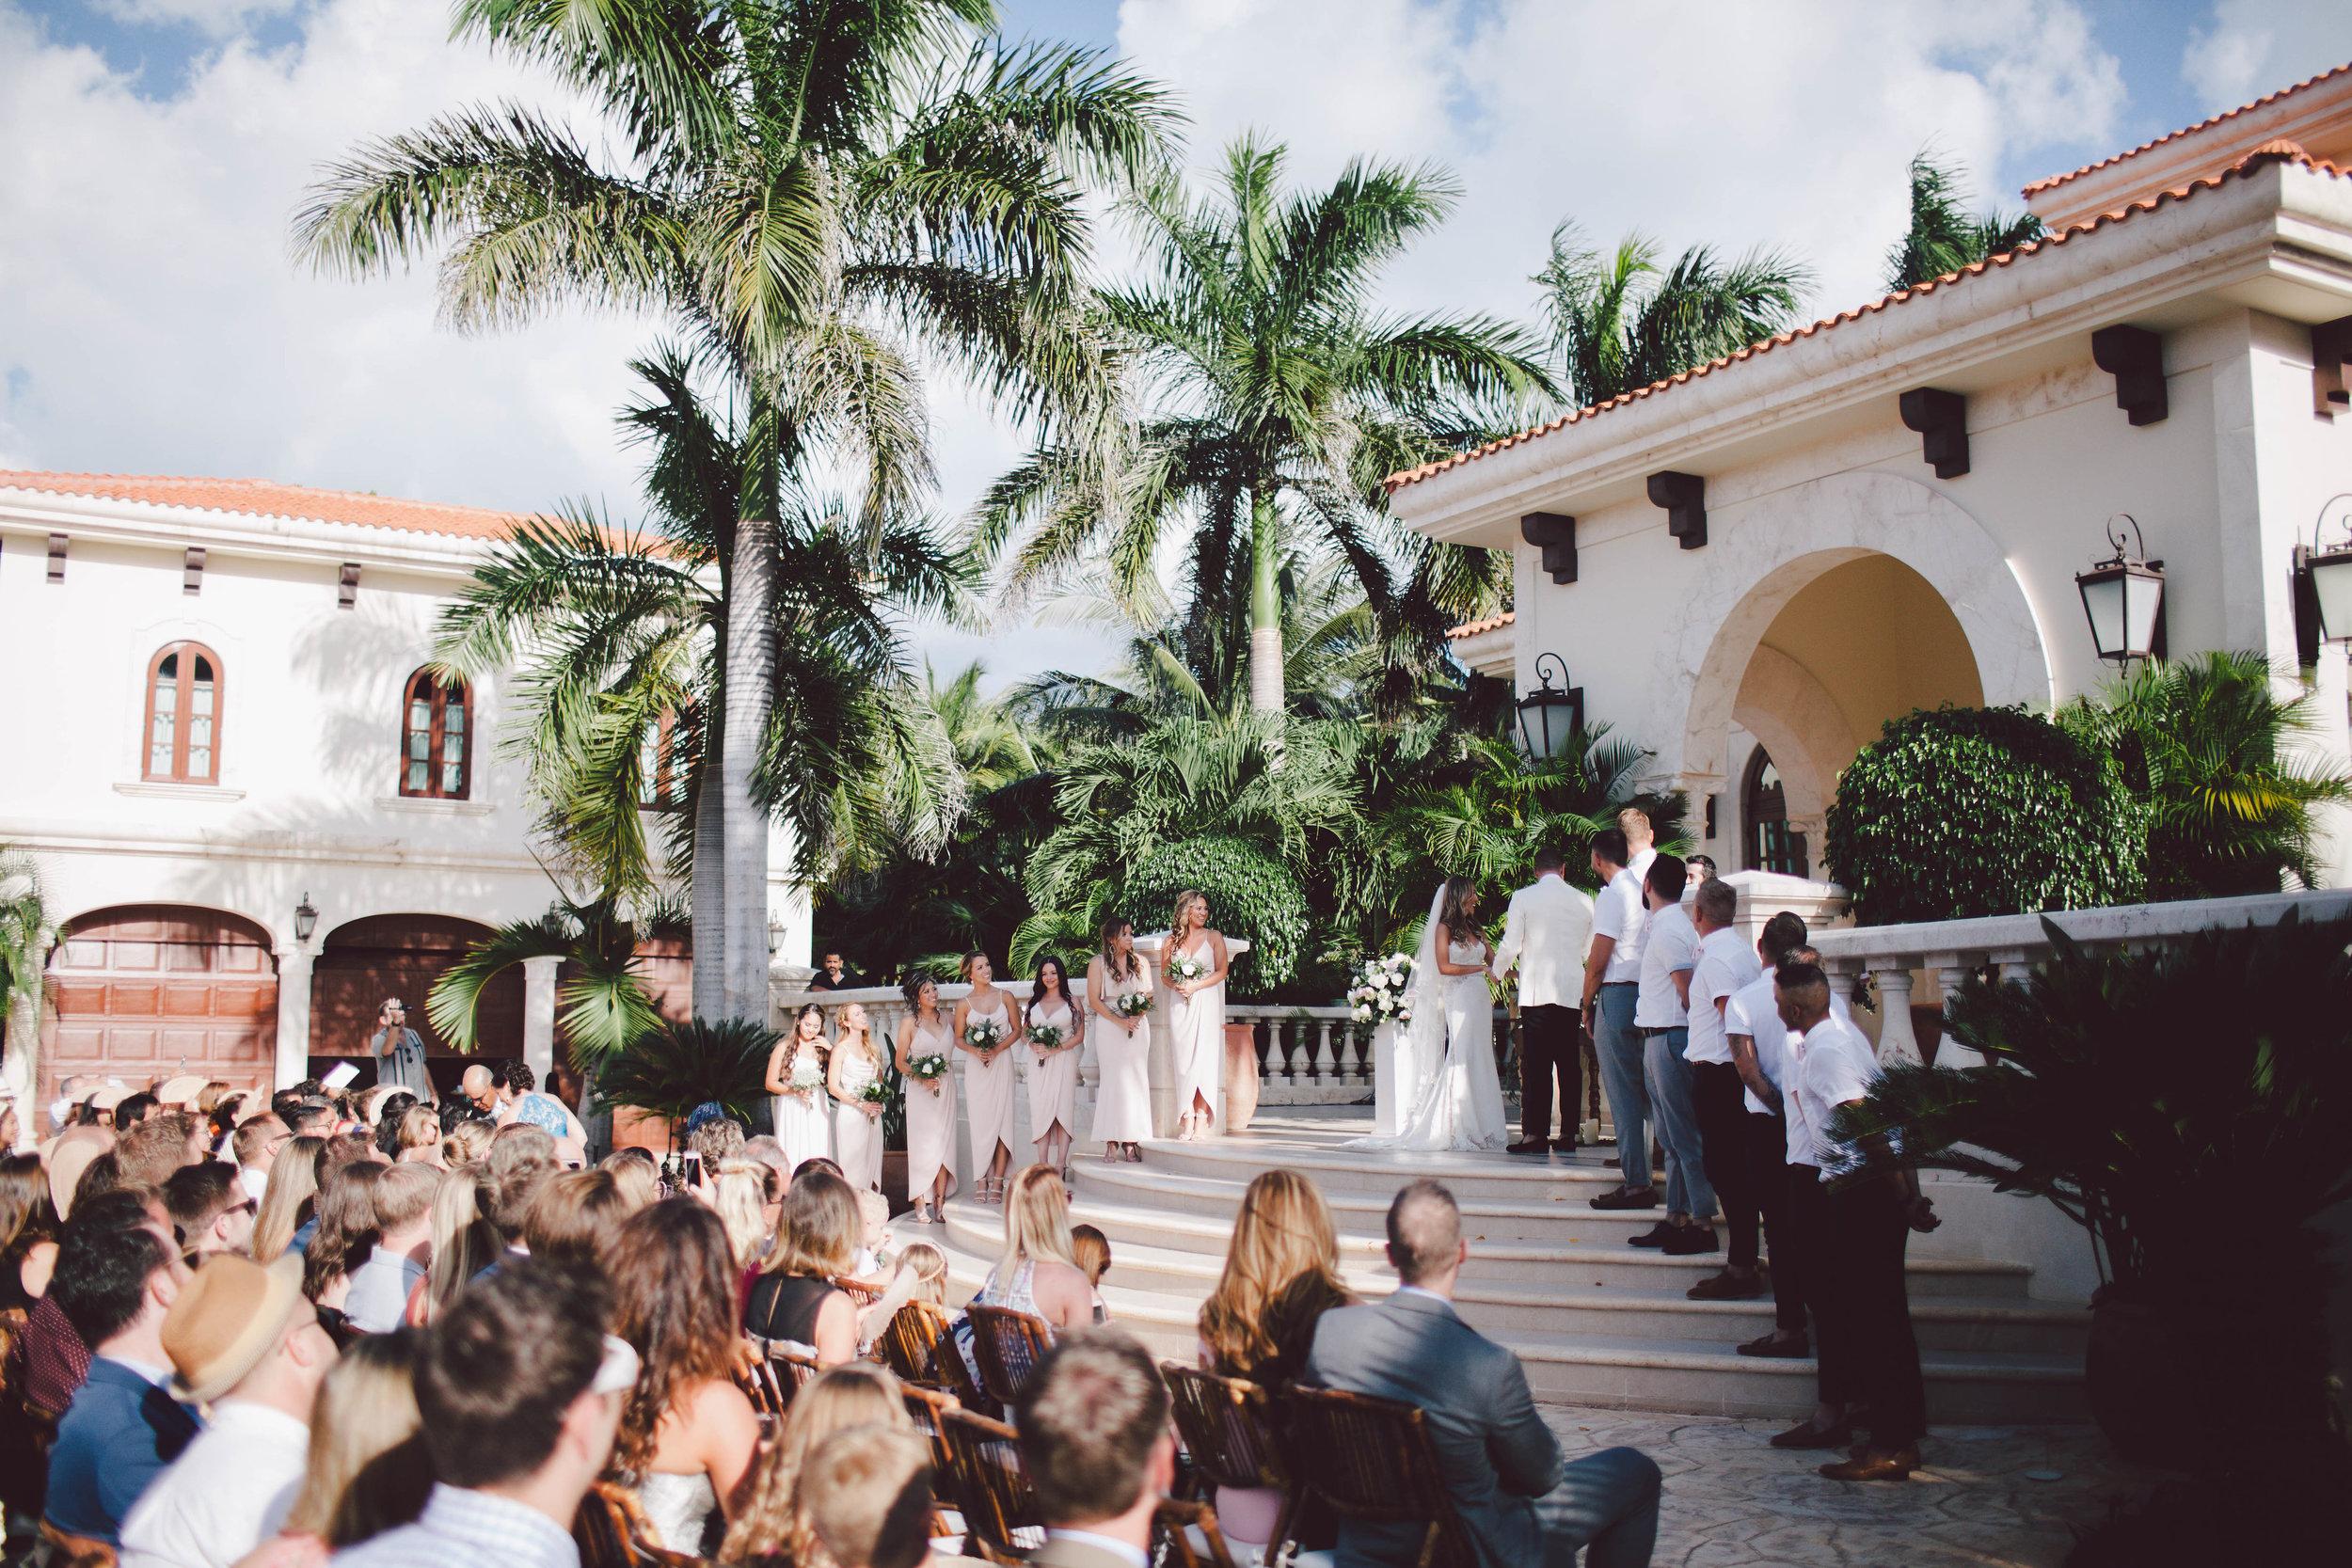 mexico_wedding_cancun_villa_la_joya_evangeline_lane_052.jpg